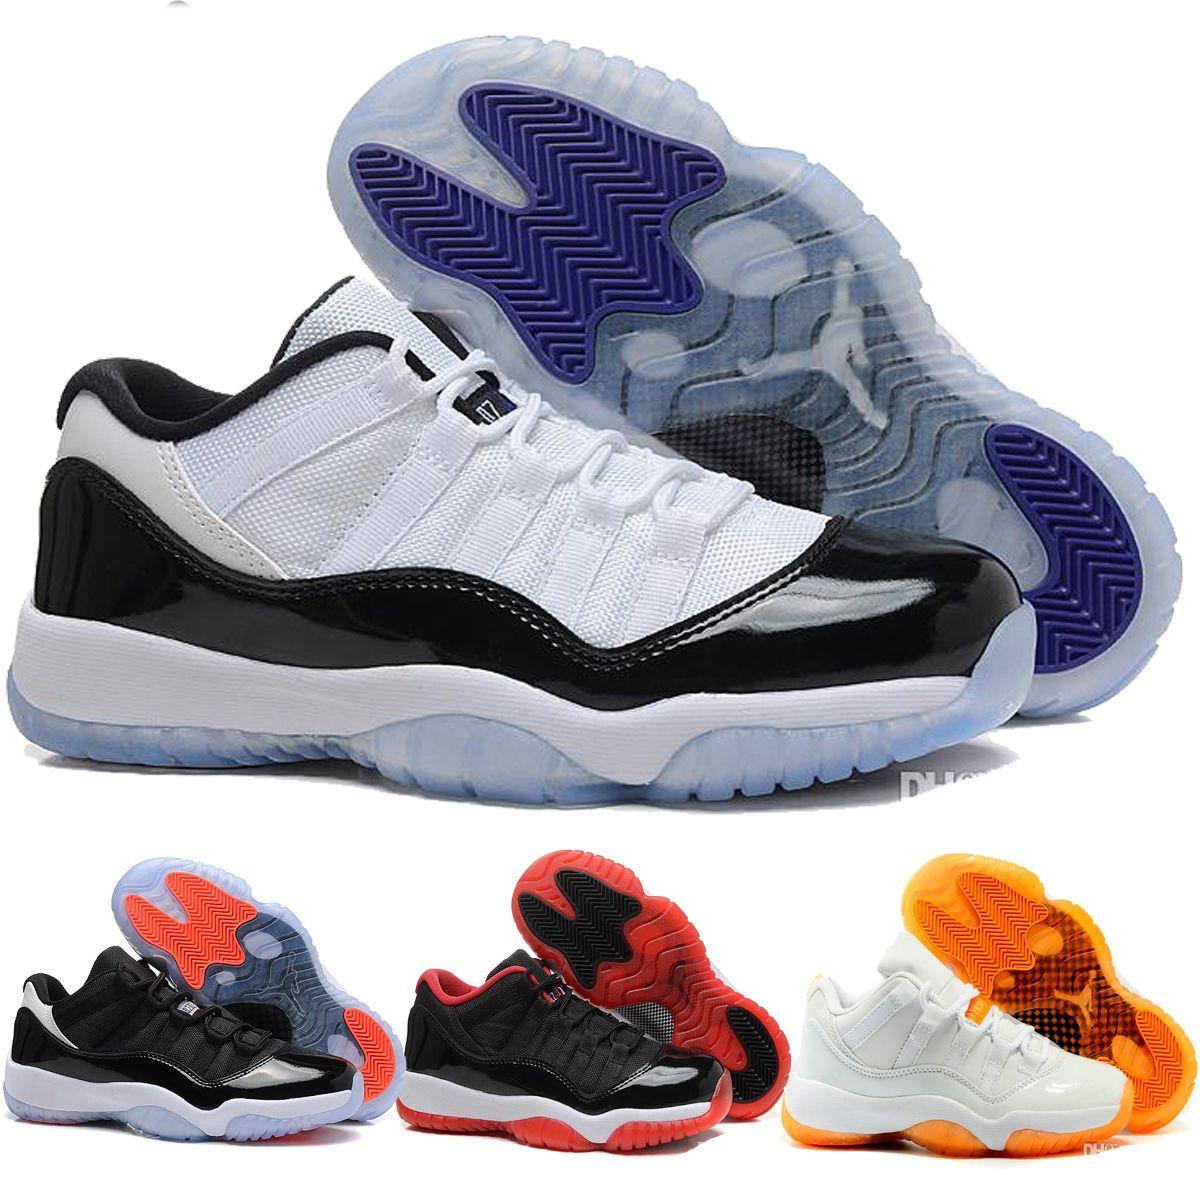 Retro 11 Low Basketball Shoes,Men Bred